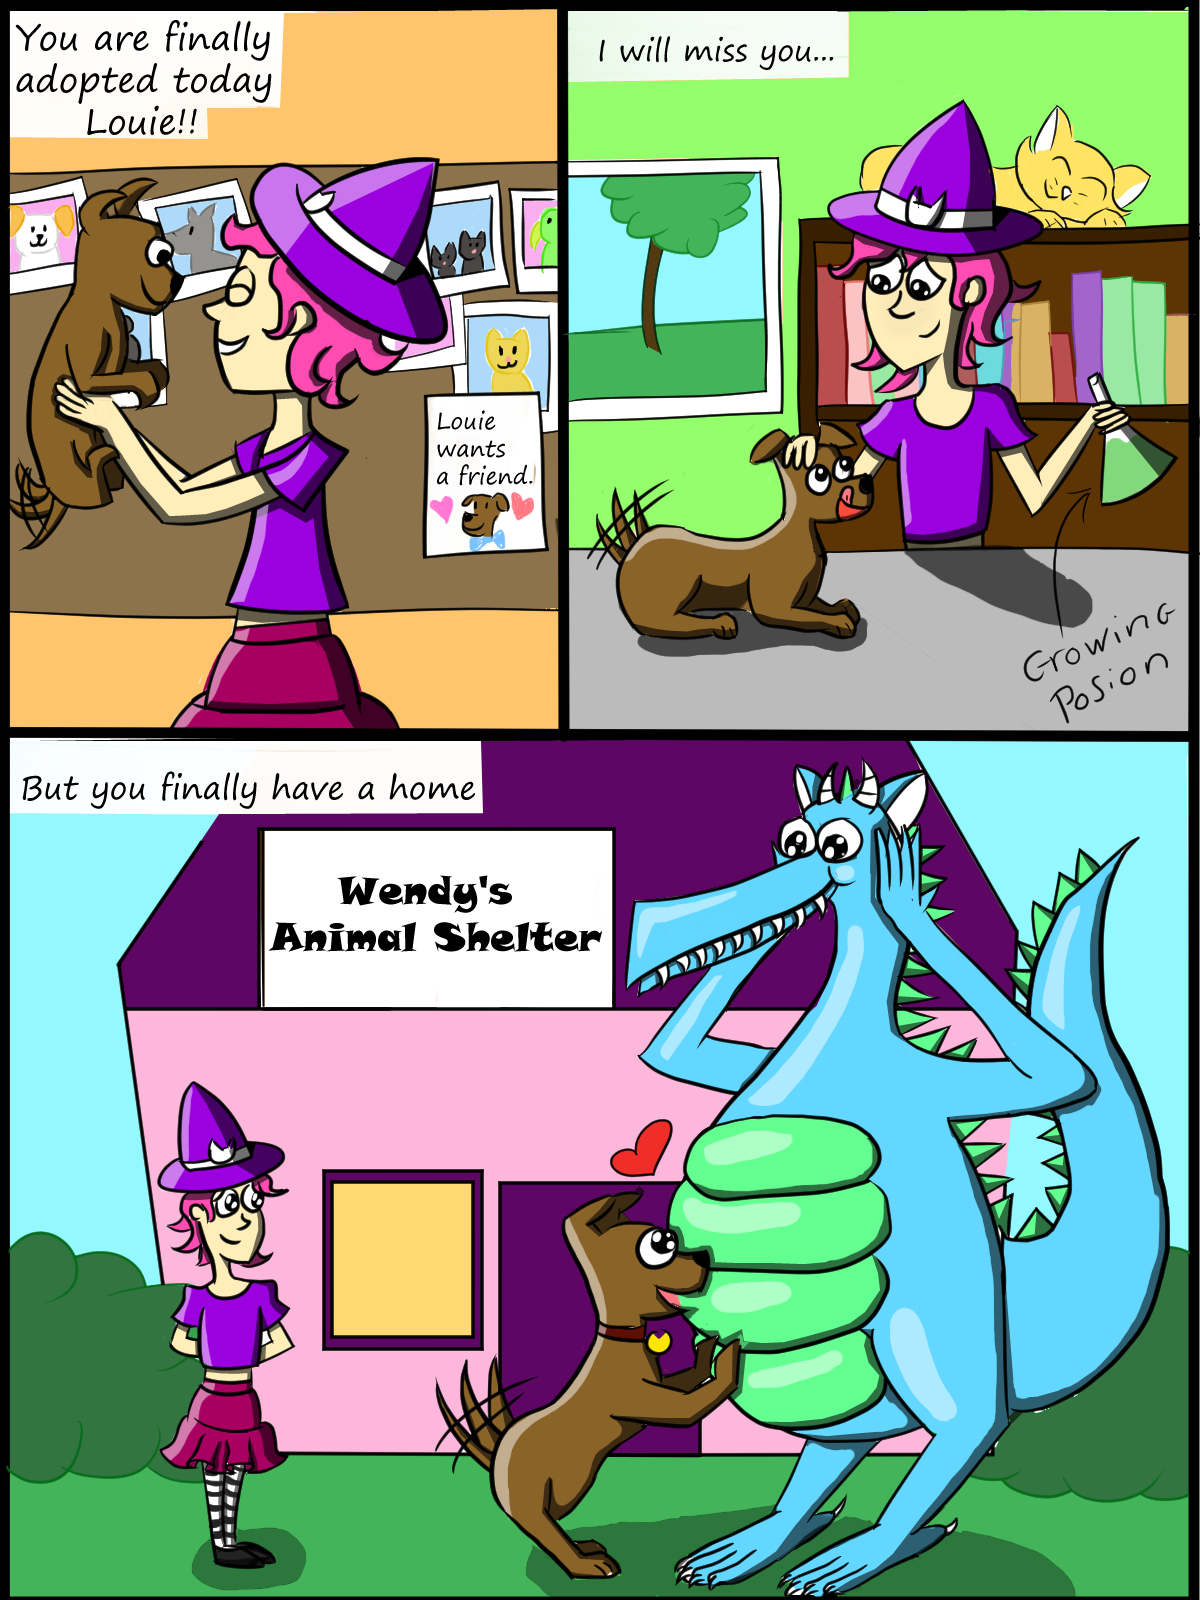 Wendy's Animal Shelter